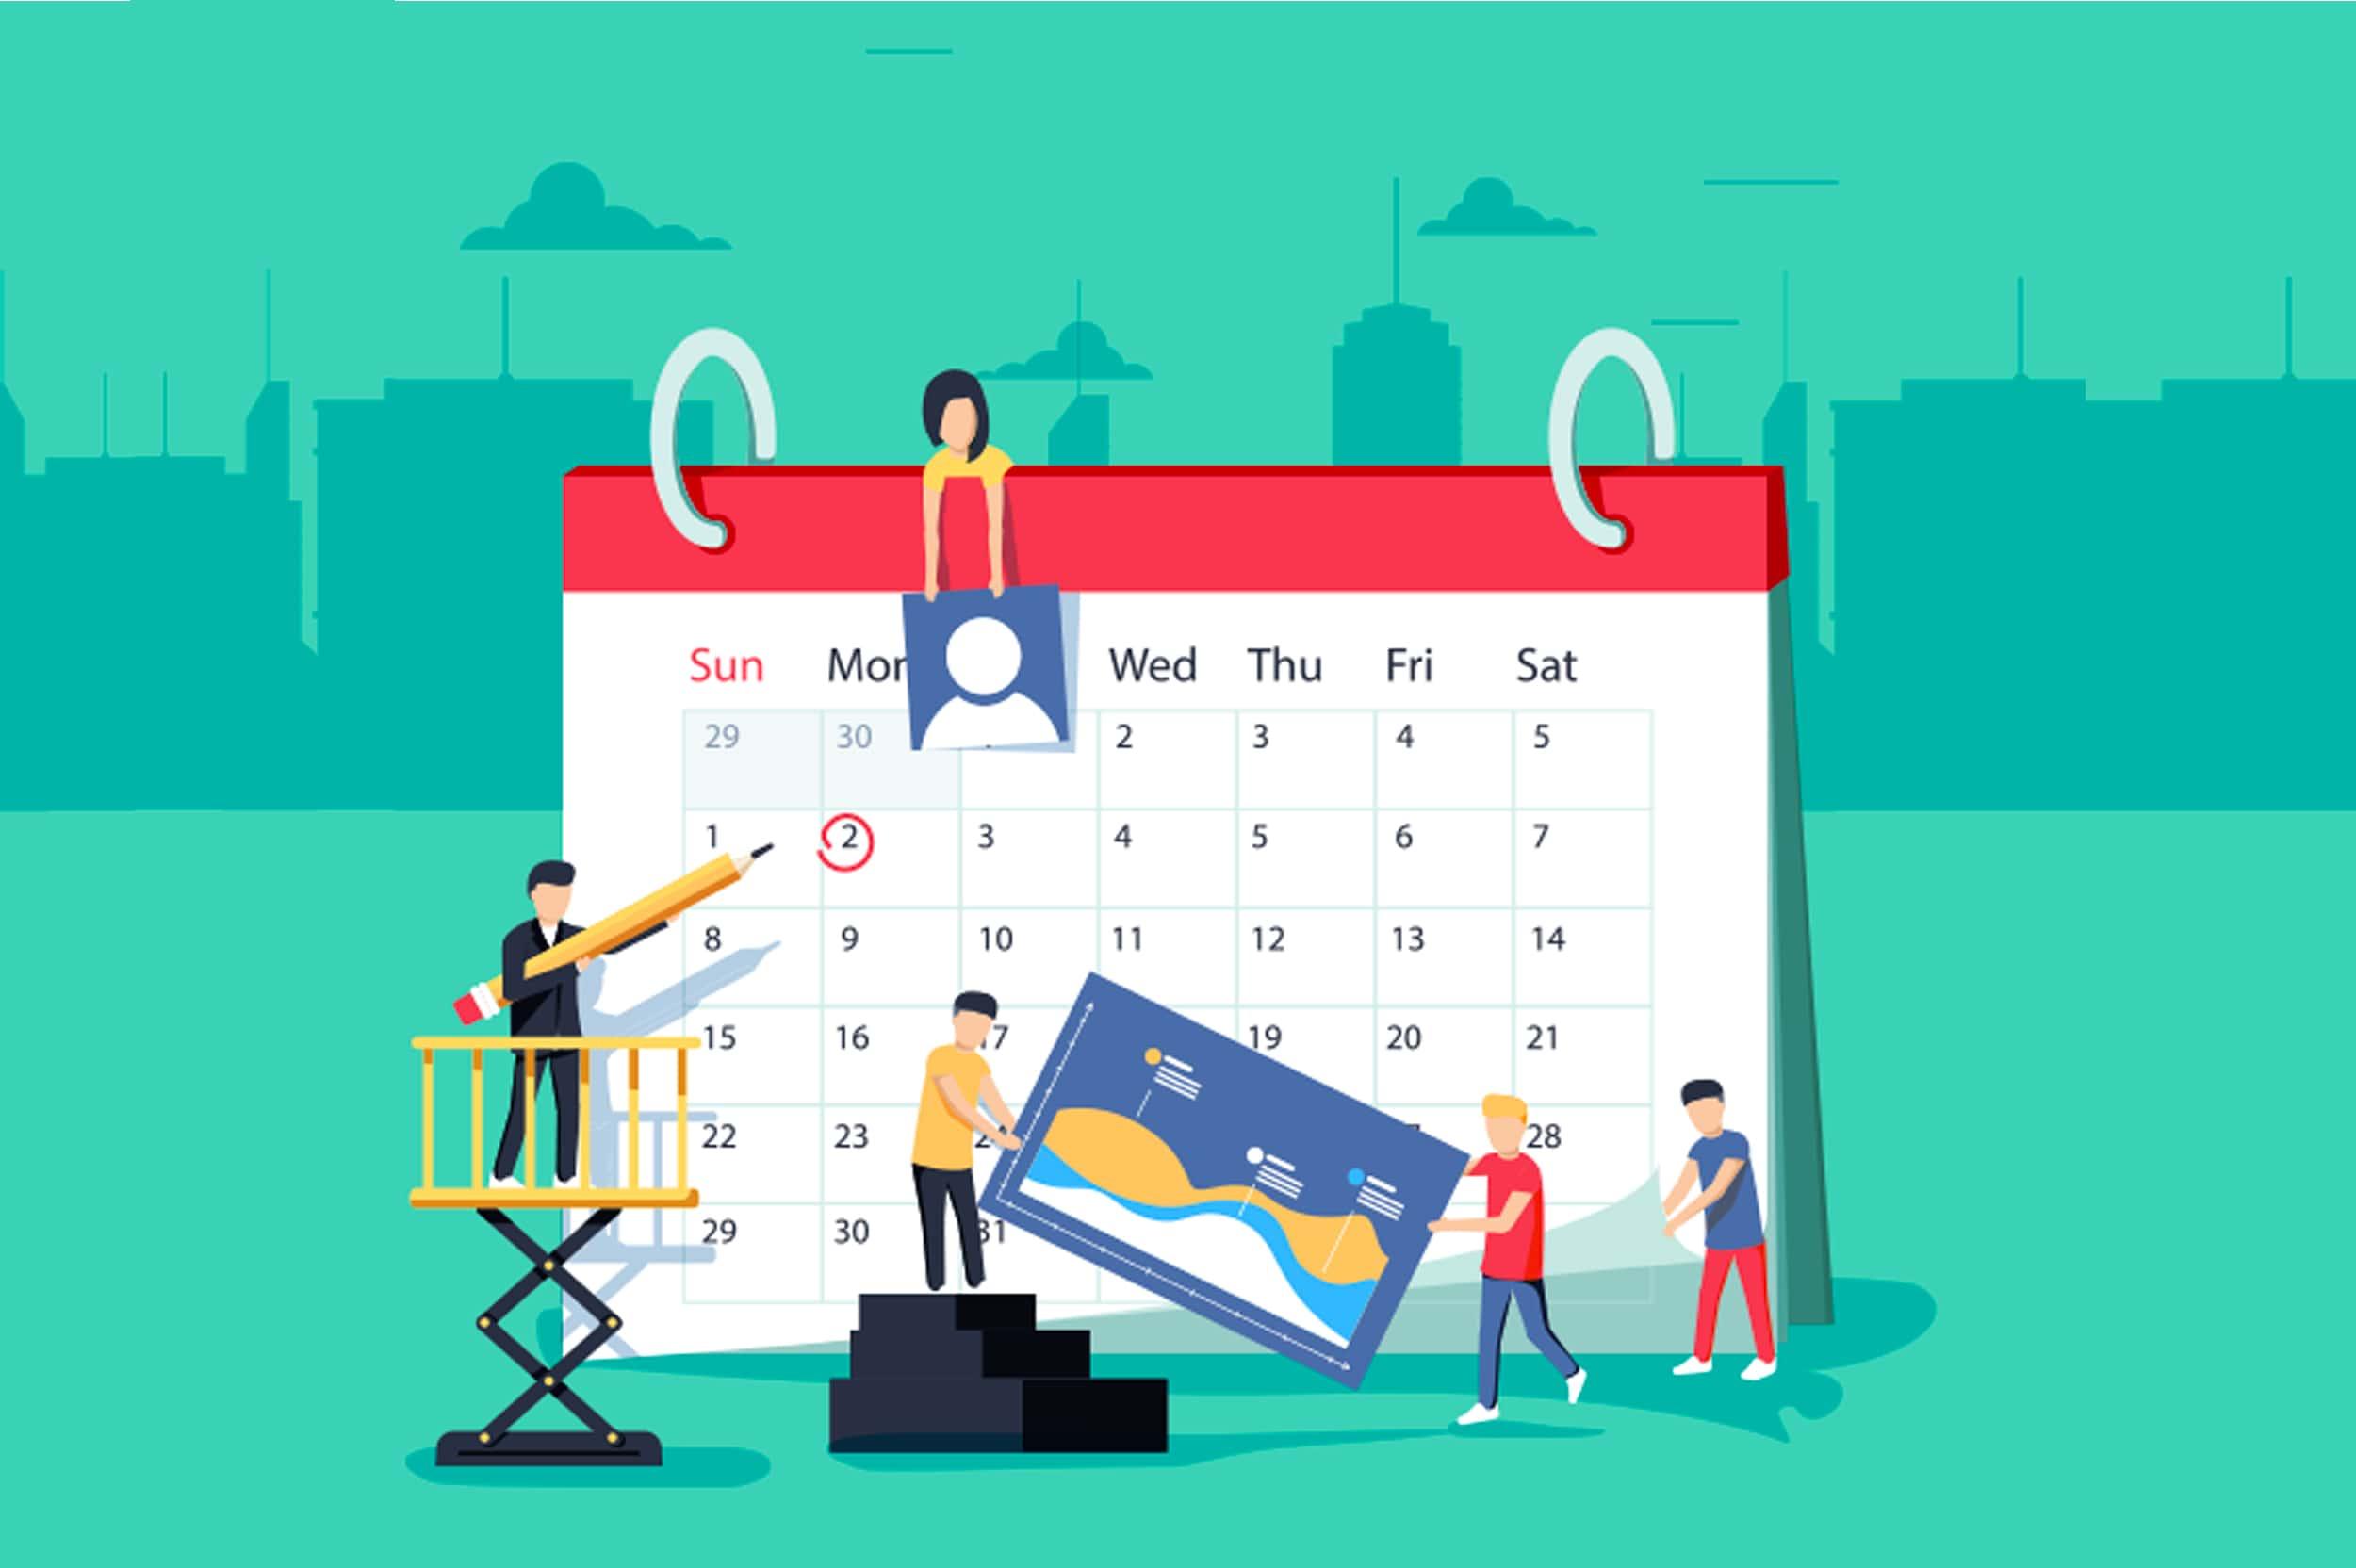 How to Schedule Tweets: Tips & Best Practices - ShareThis